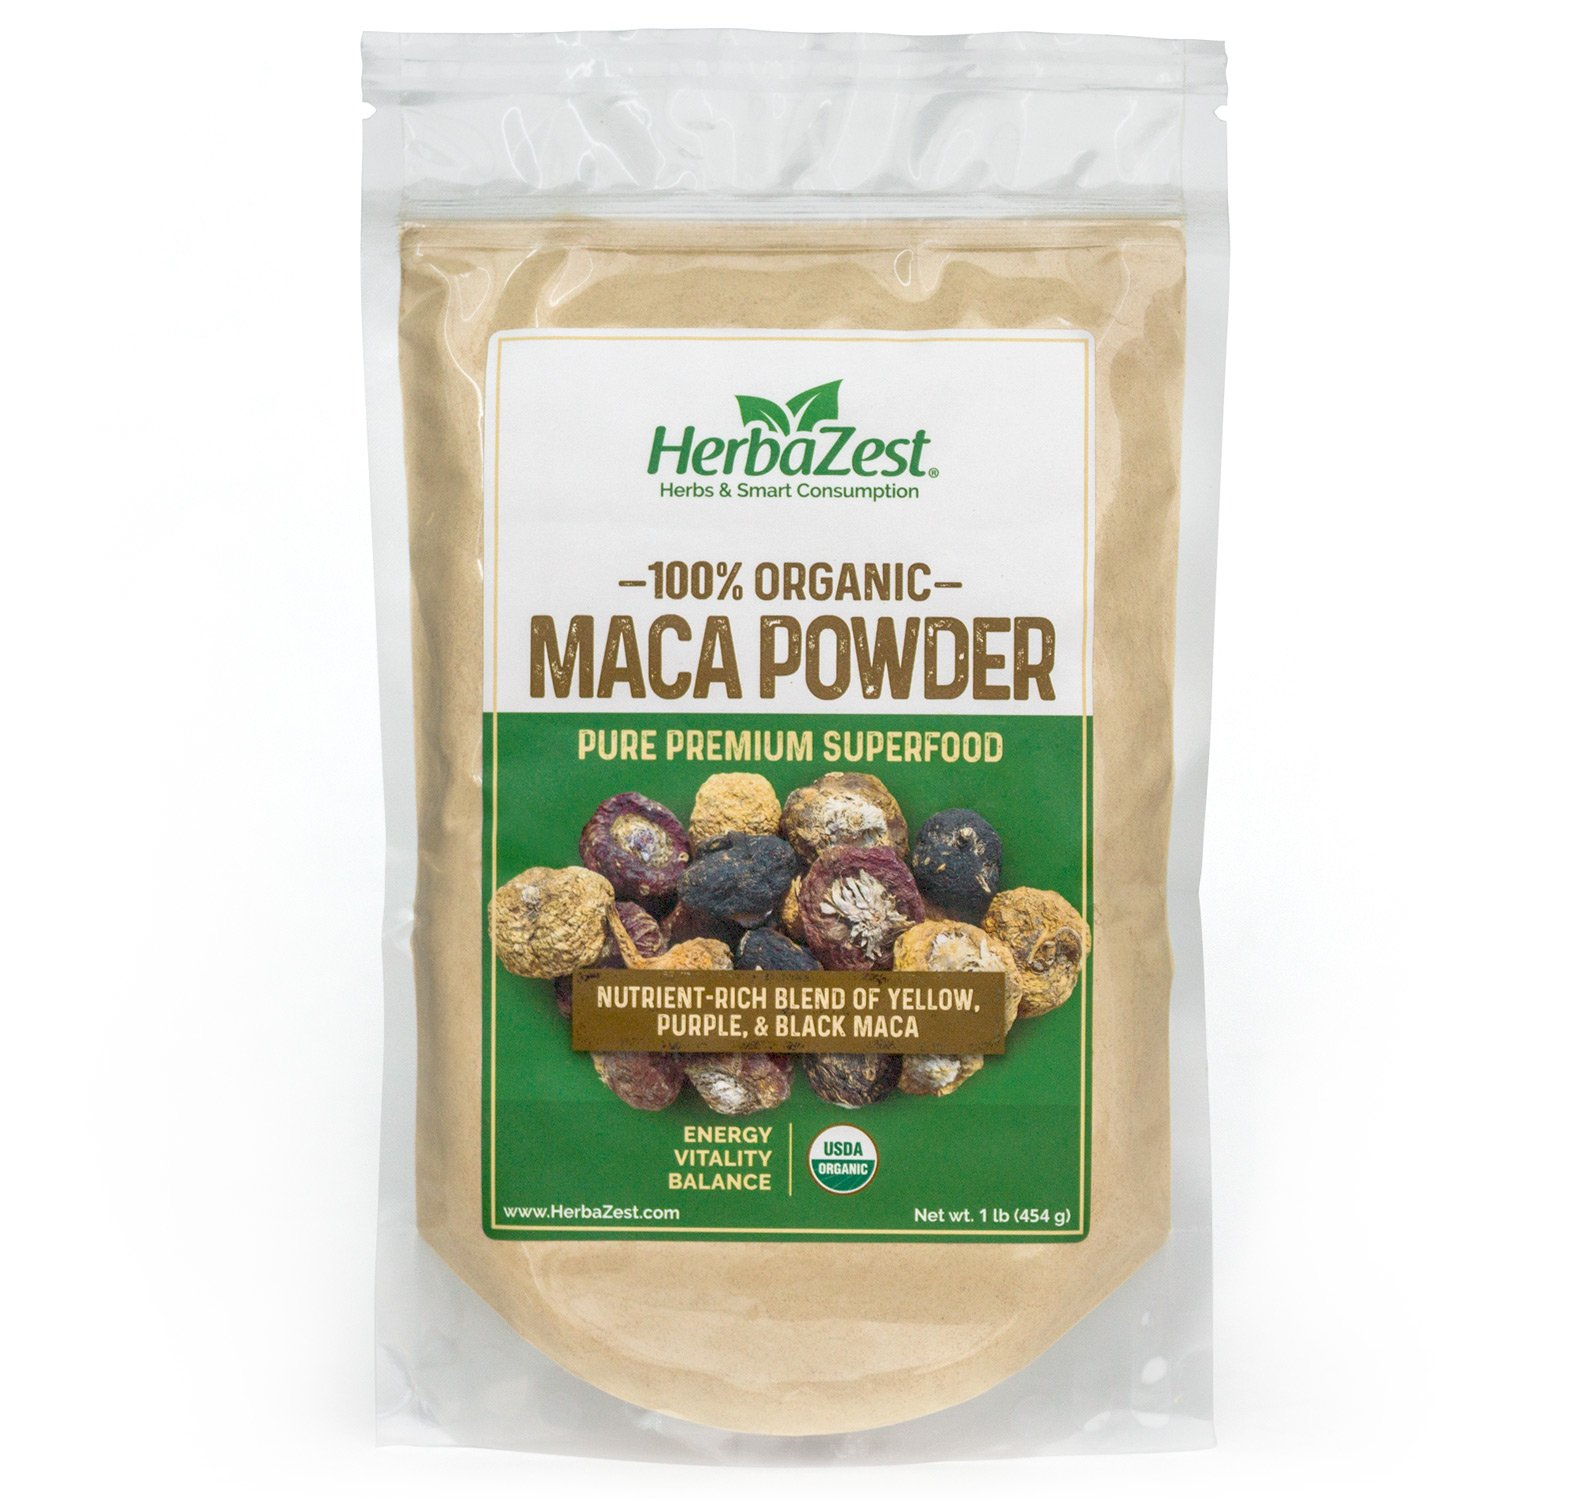 Maca Powder Organic - Peruvian Premium Blend of Yellow, Purple & Black Maca - Vegan & USDA Certified - 16oz (454g) - Perfect for Smoothies, Juices, Baking, Yogurt & Cereal